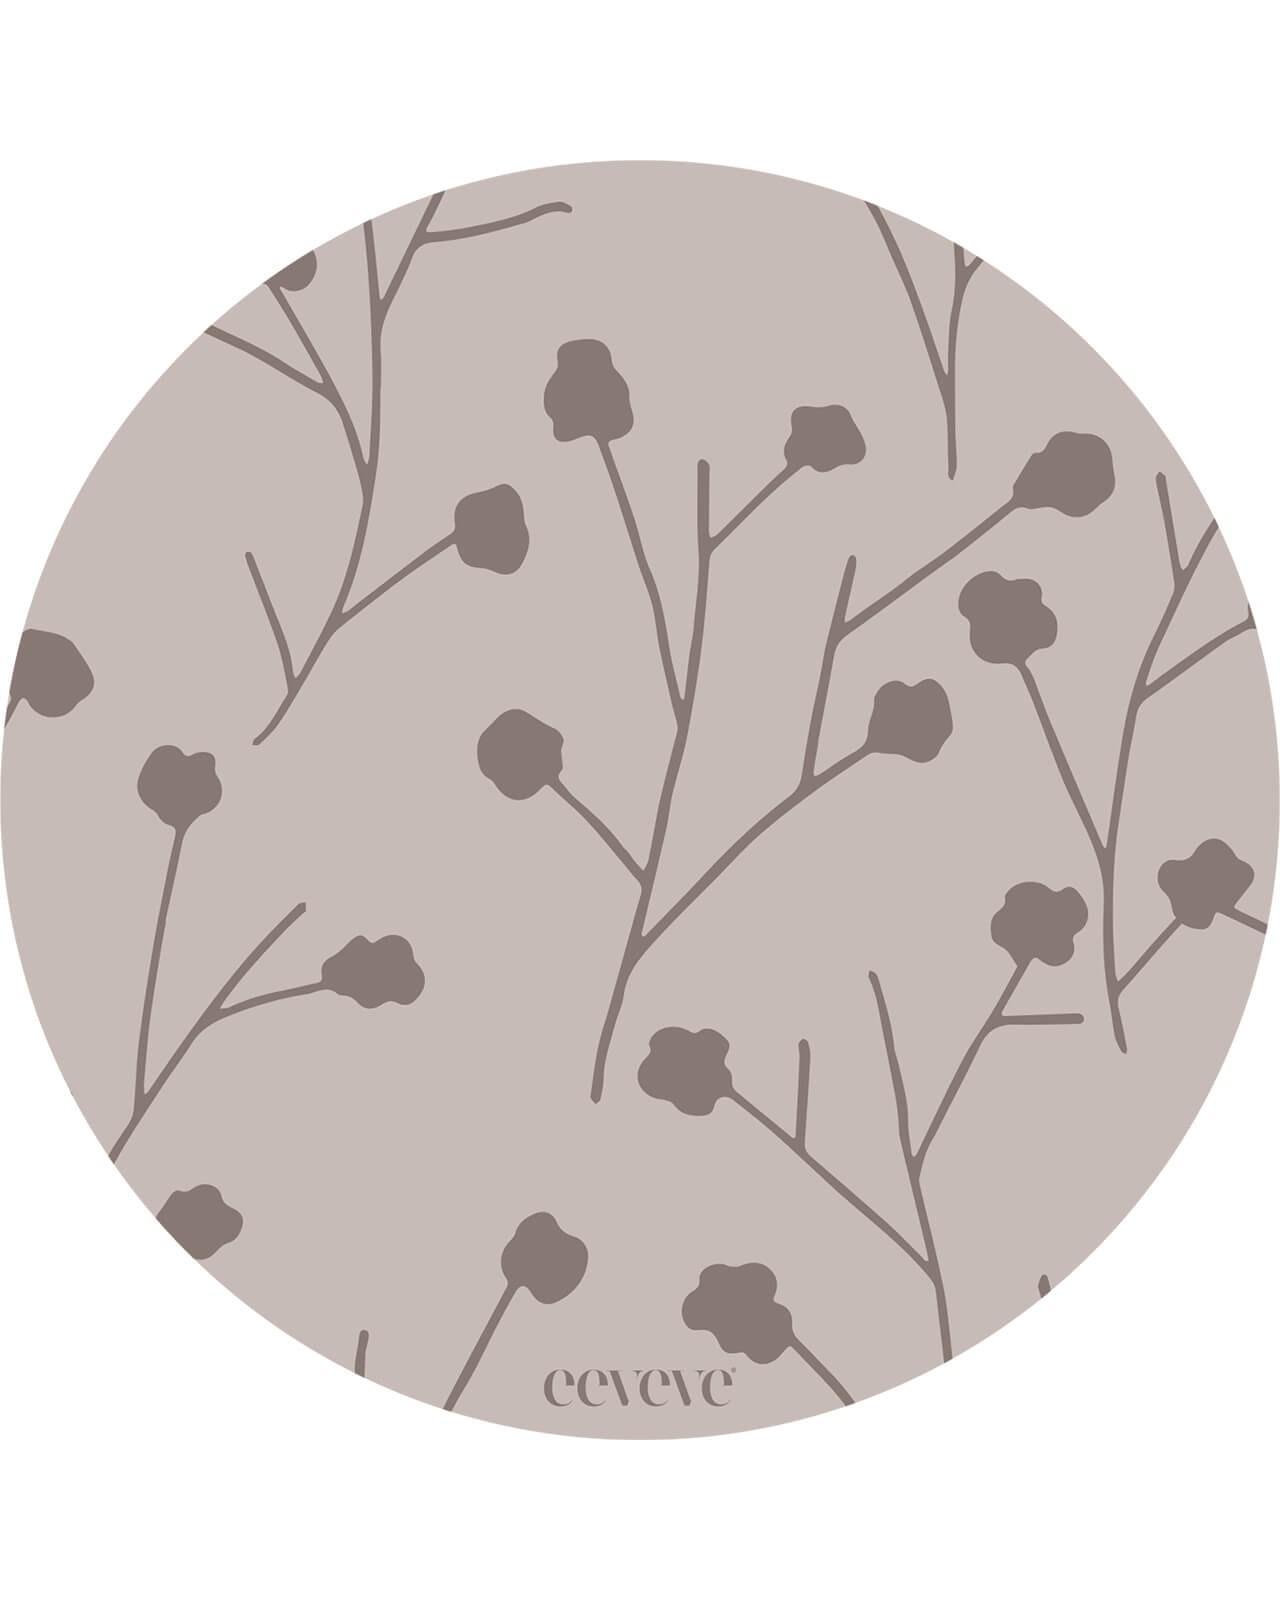 Eeveve - 12x Onderleggers Flower twig - Dust